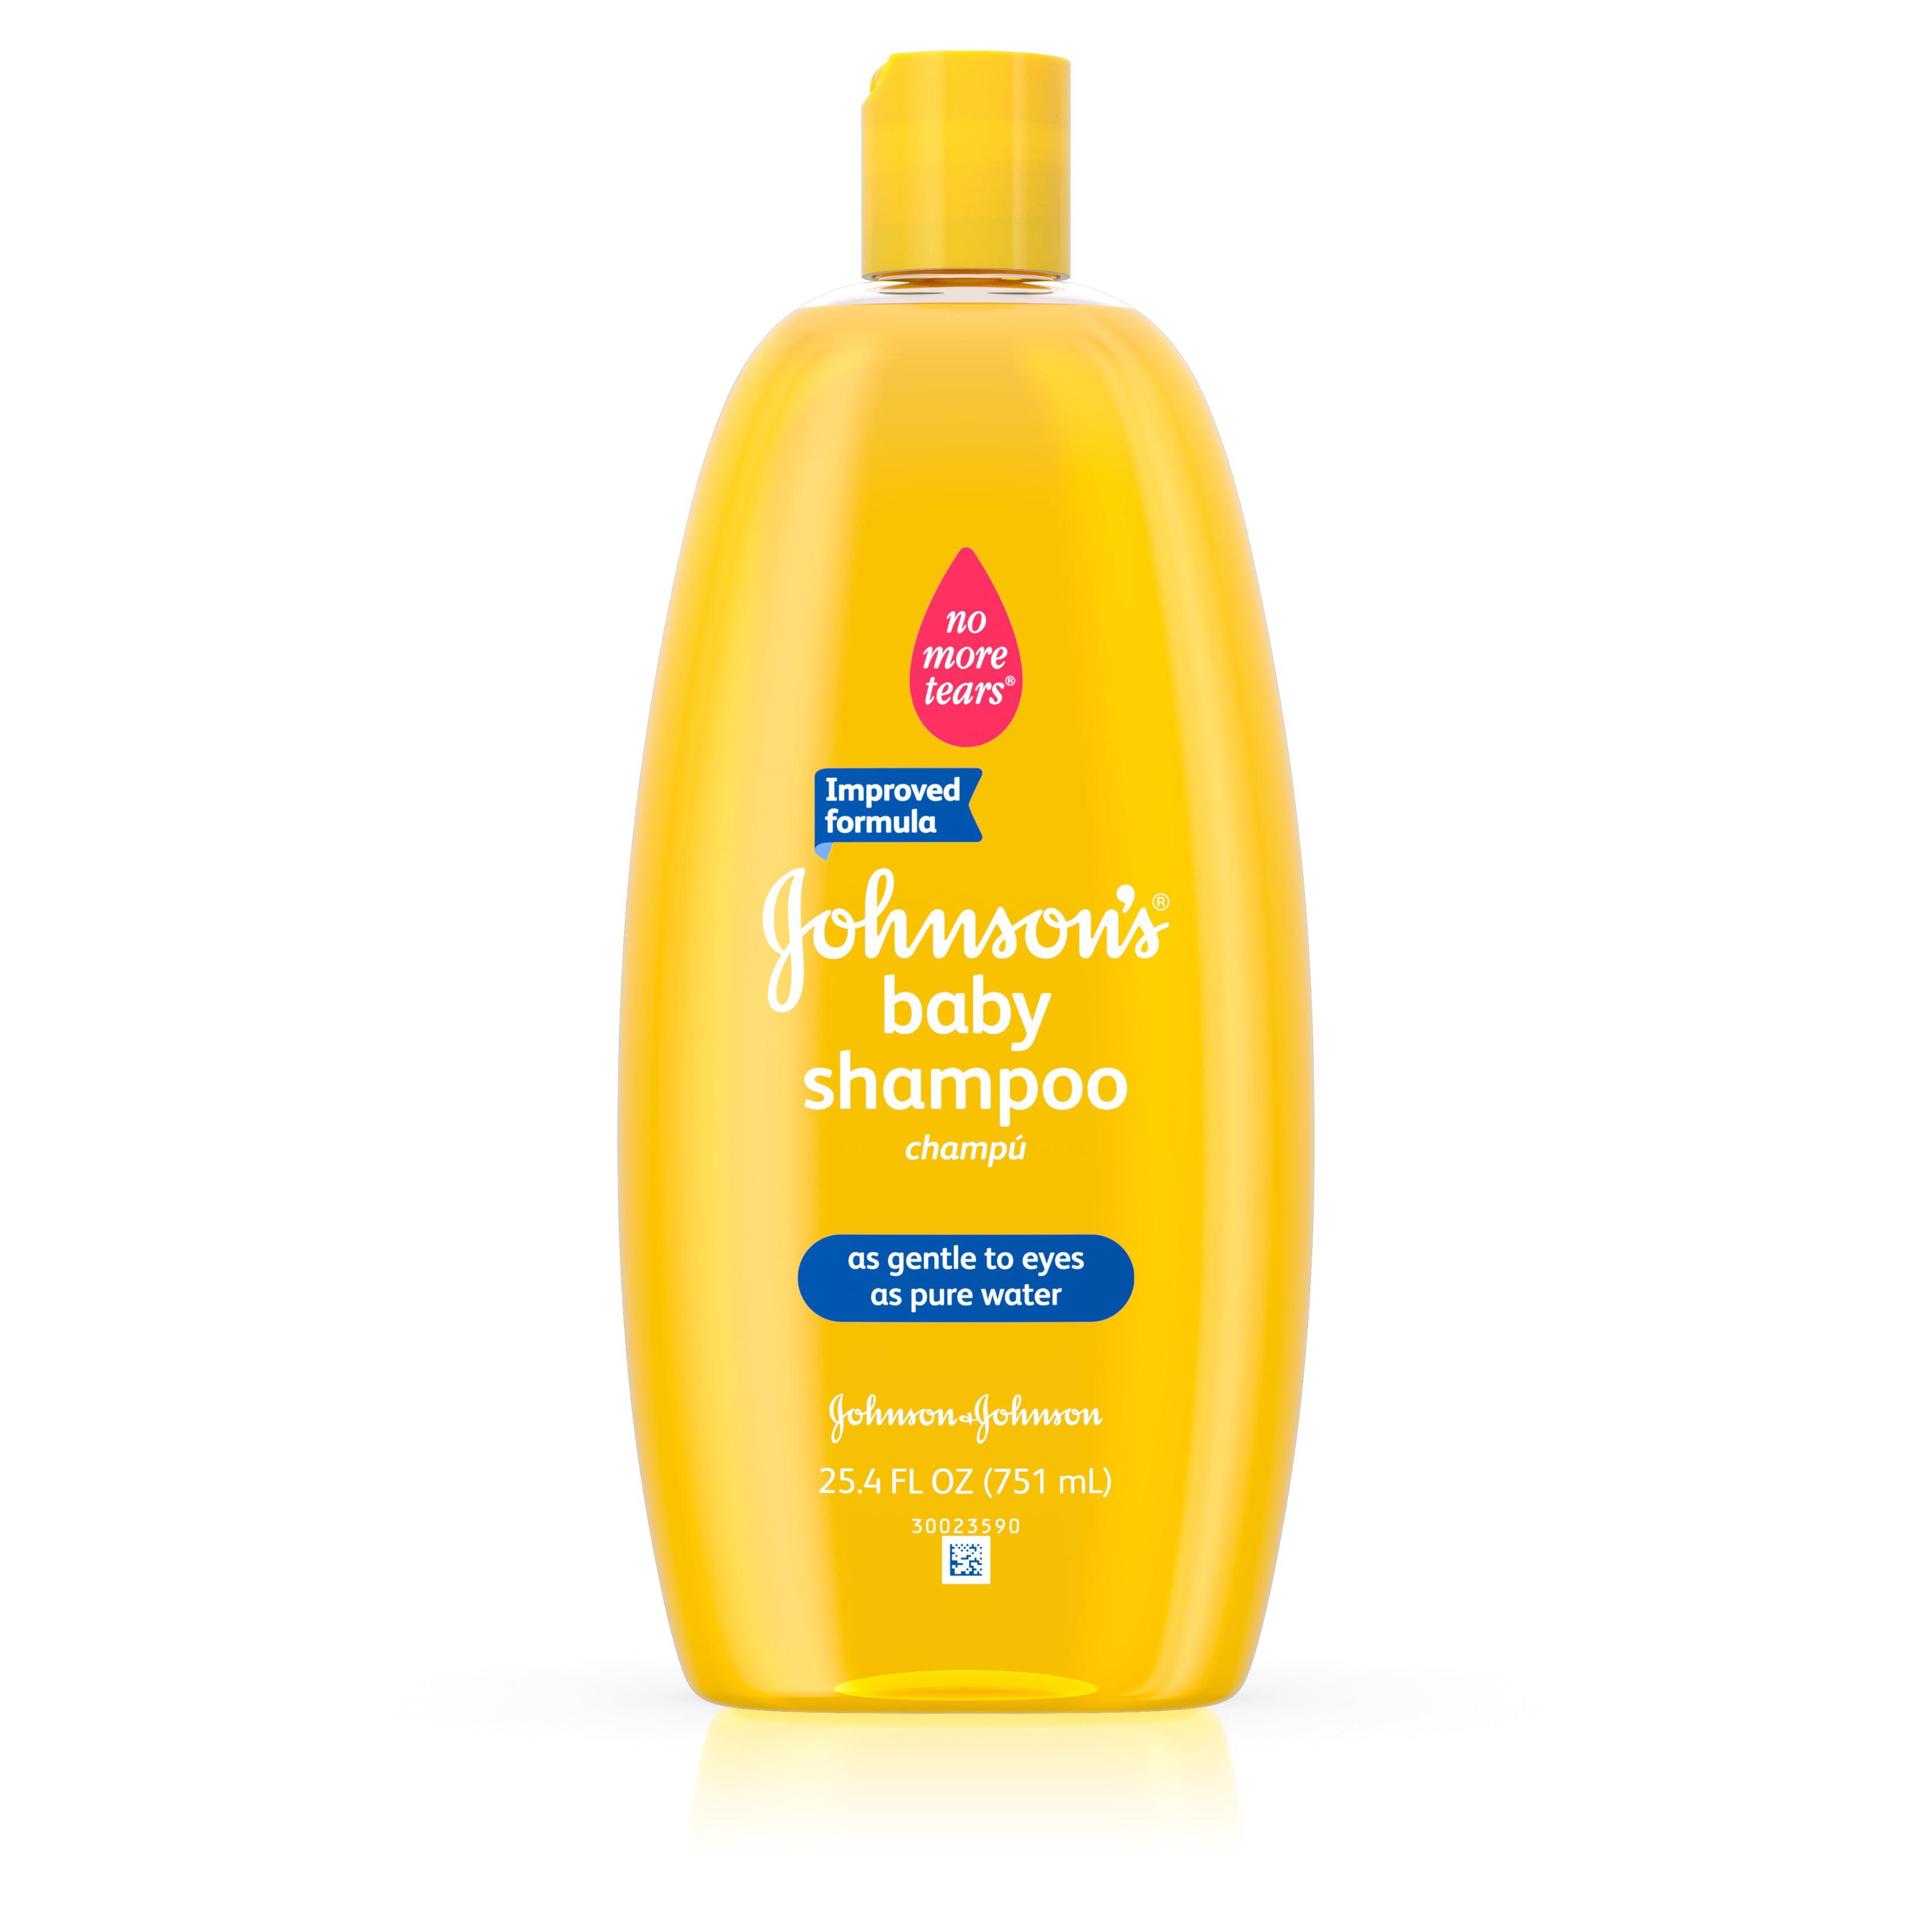 Johnson's Baby Shampoo For Soft Hair, 25.4 Fl. Oz.